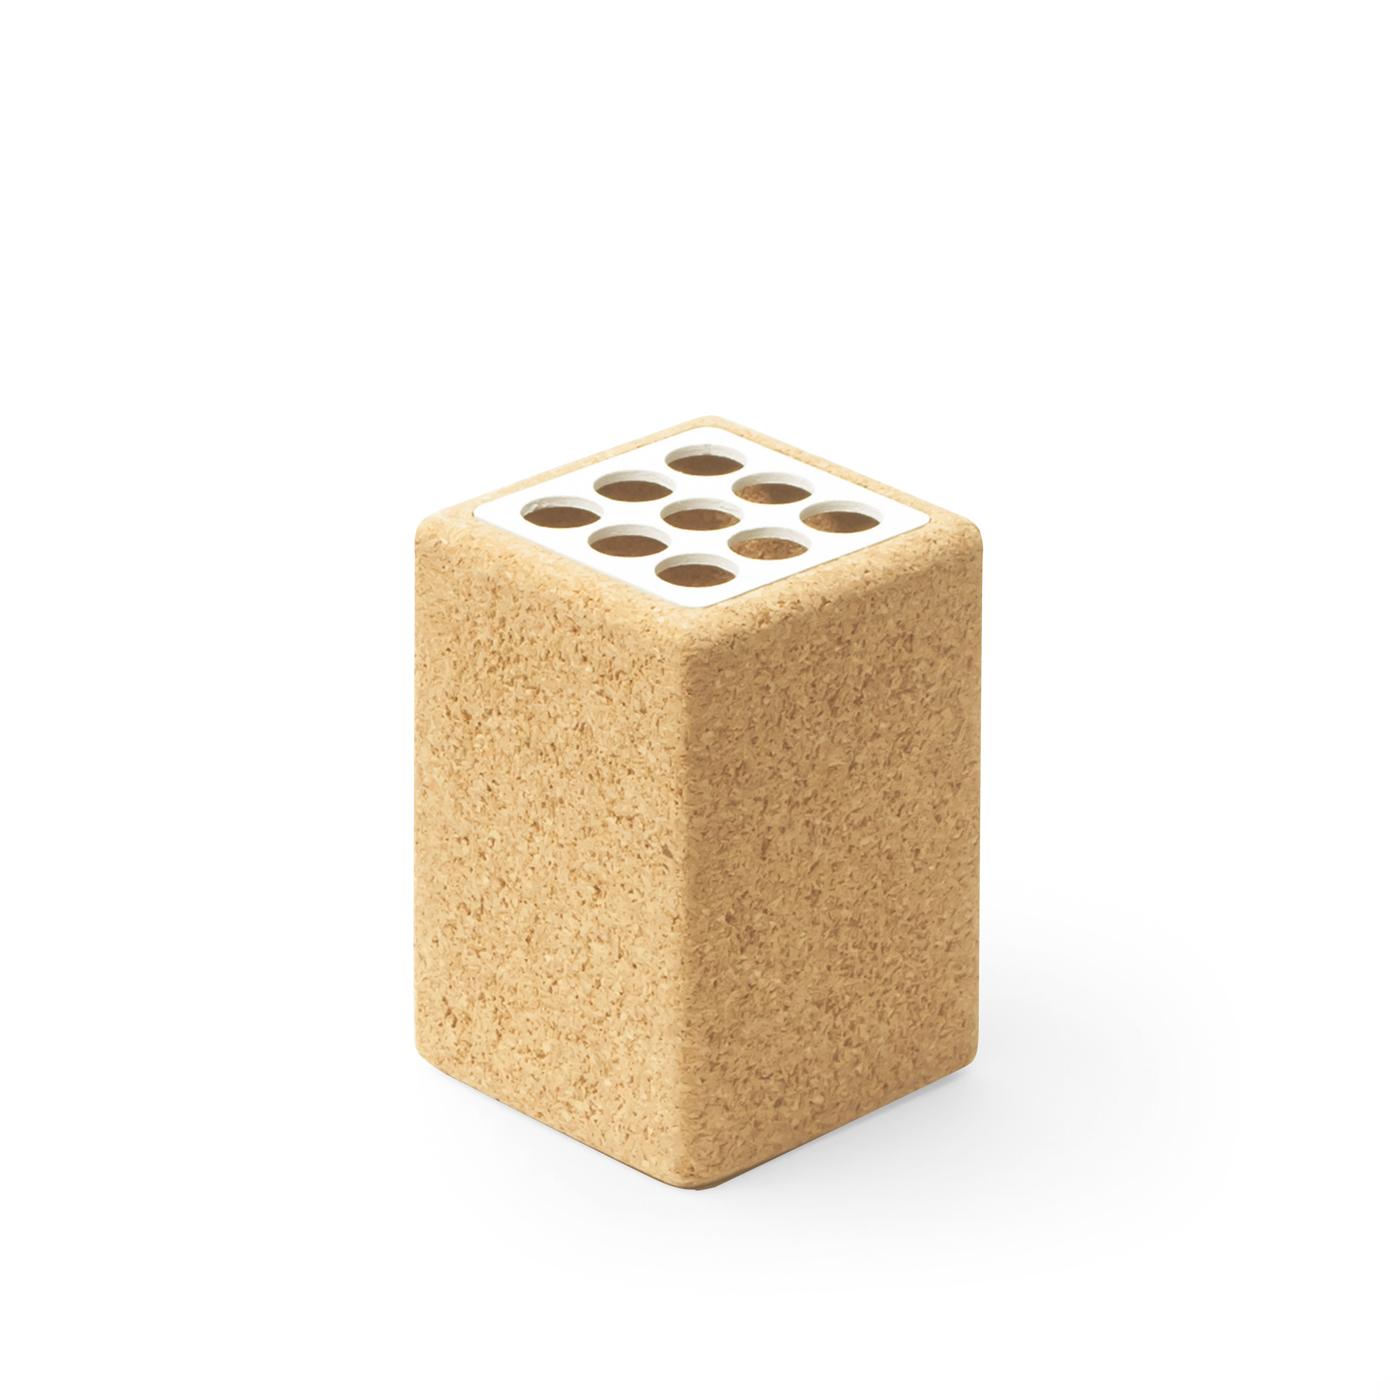 NIU-Pencil cup